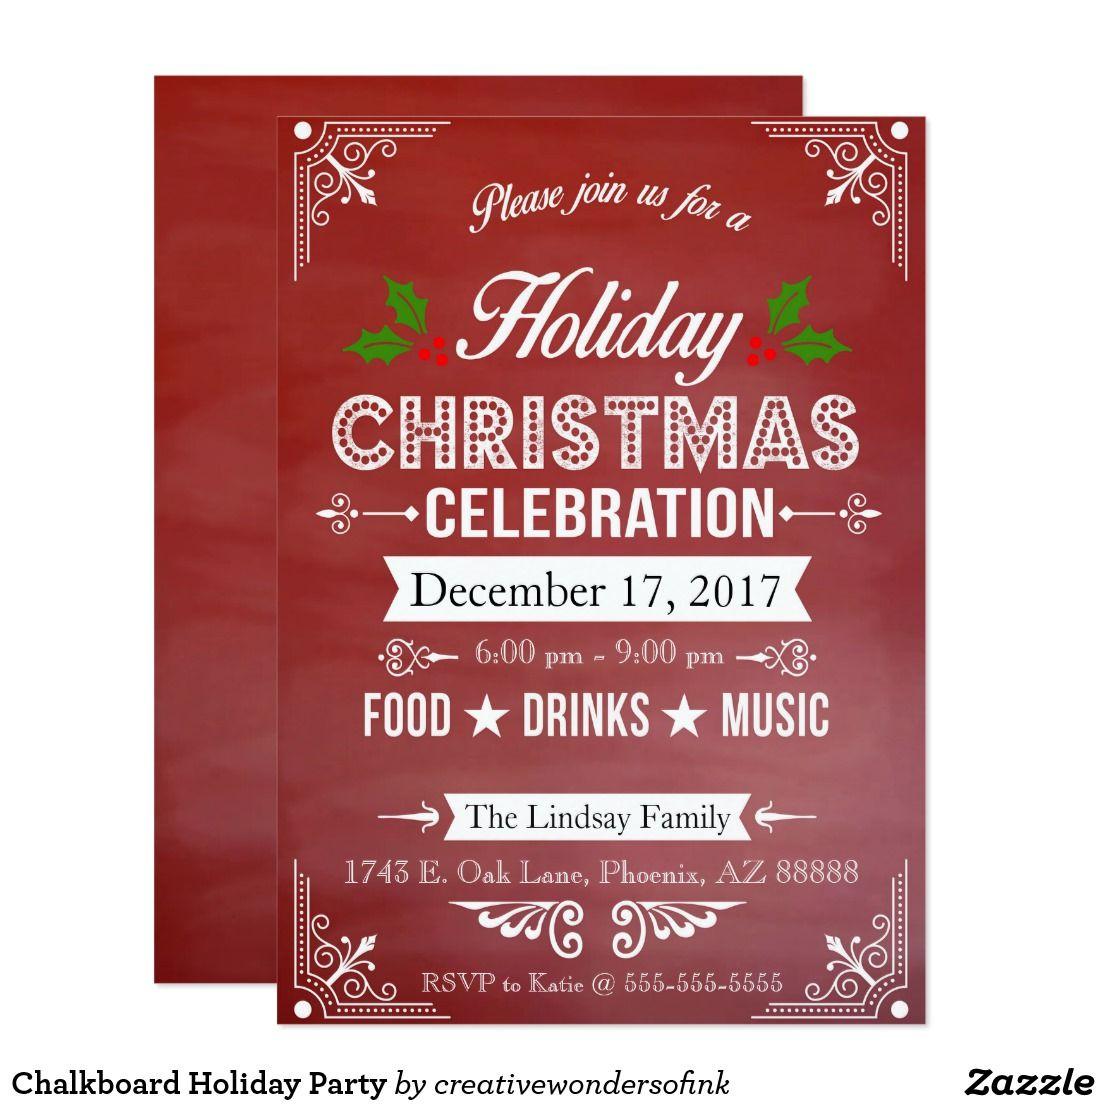 Chalkboard Holiday Party Invitation | Holidays, Celebrations, Events ...